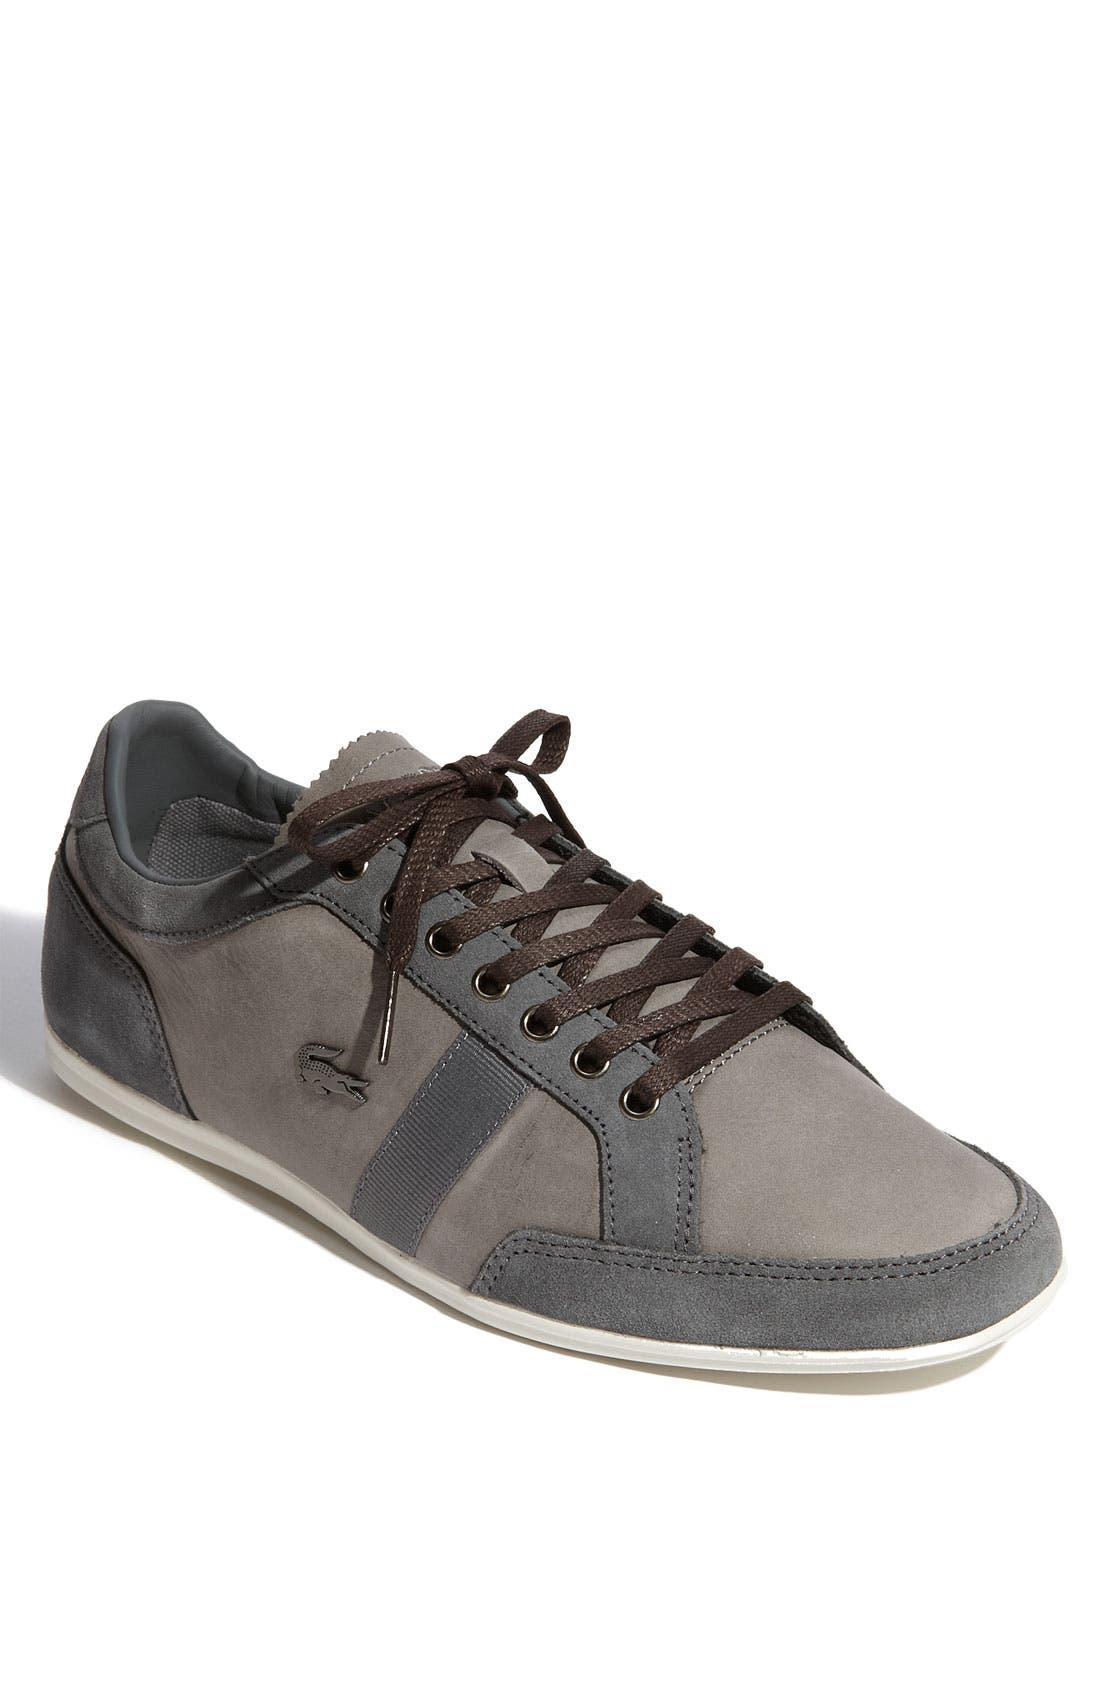 Alternate Image 1 Selected - Lacoste 'Alisos' Sneaker